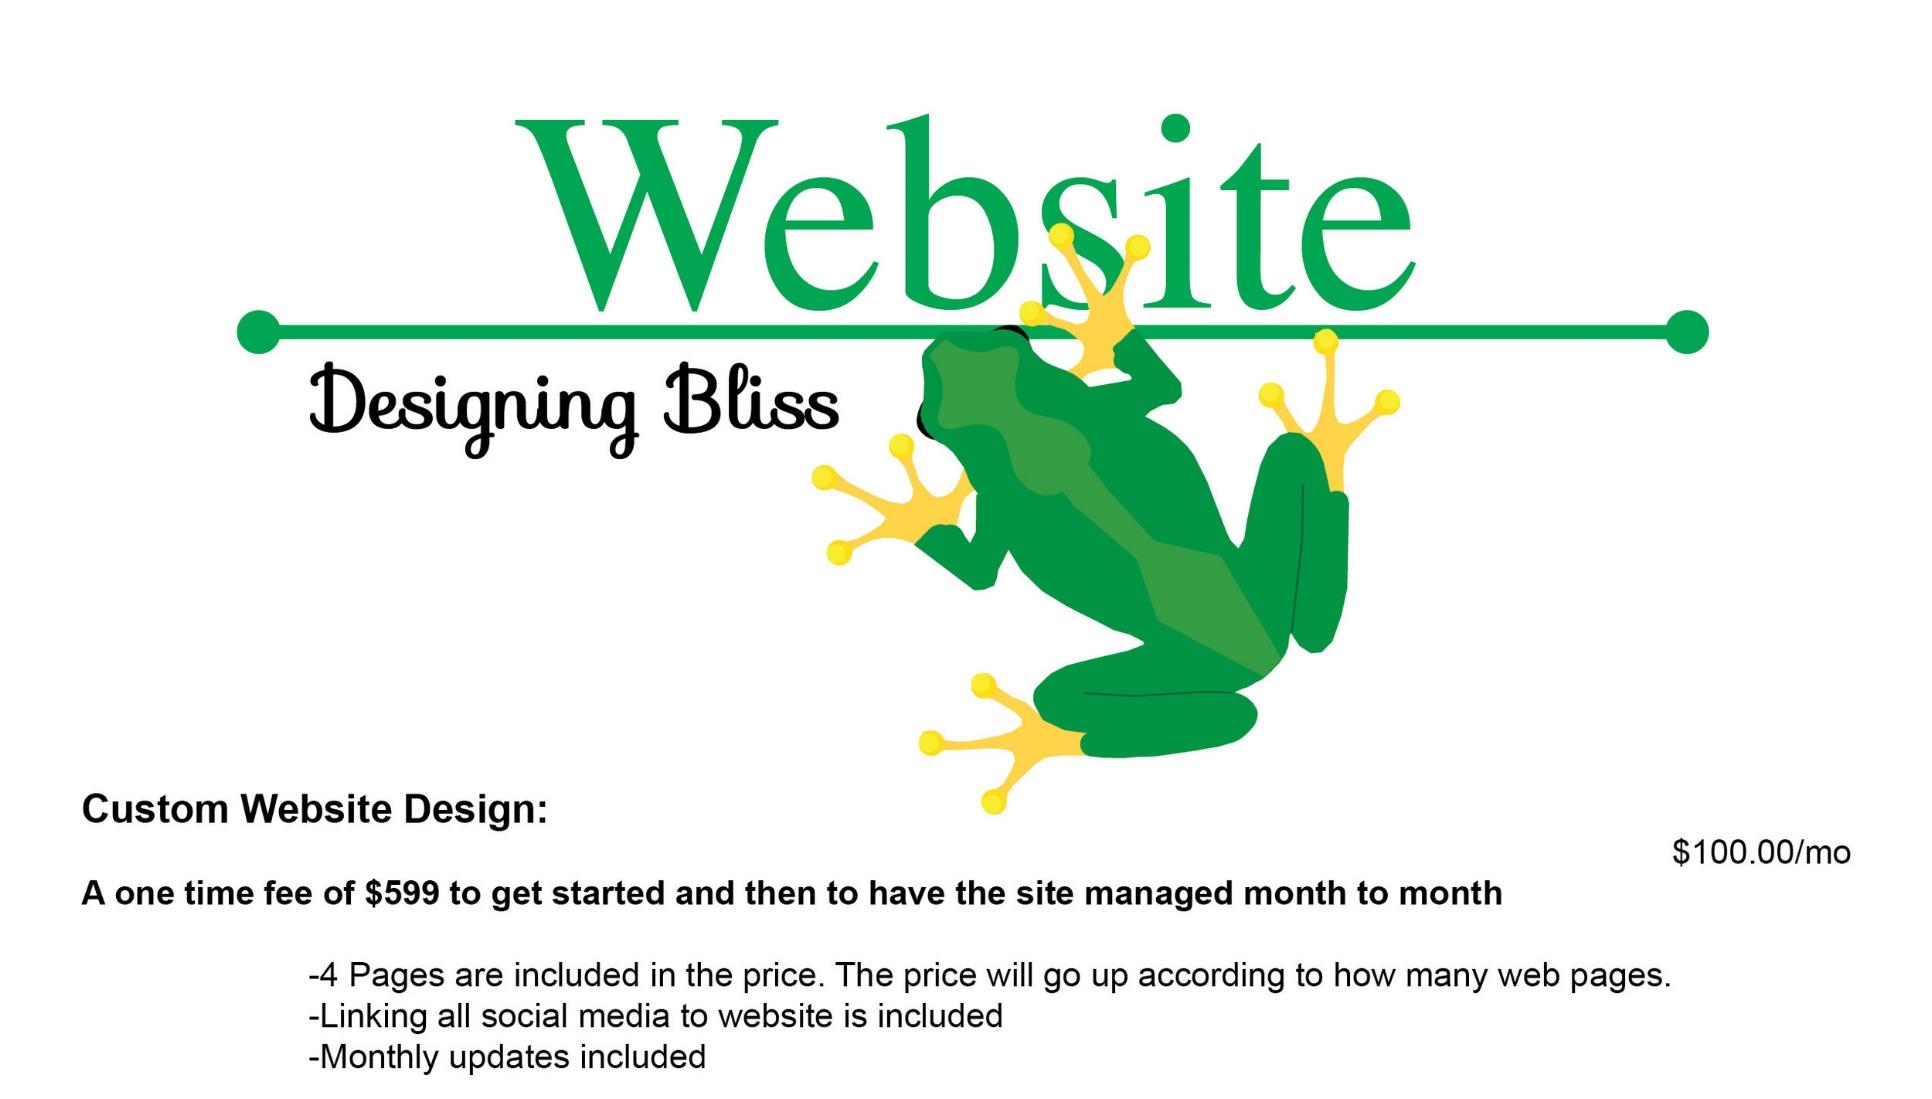 Designing Bliss Marketing Flyer4.jpg